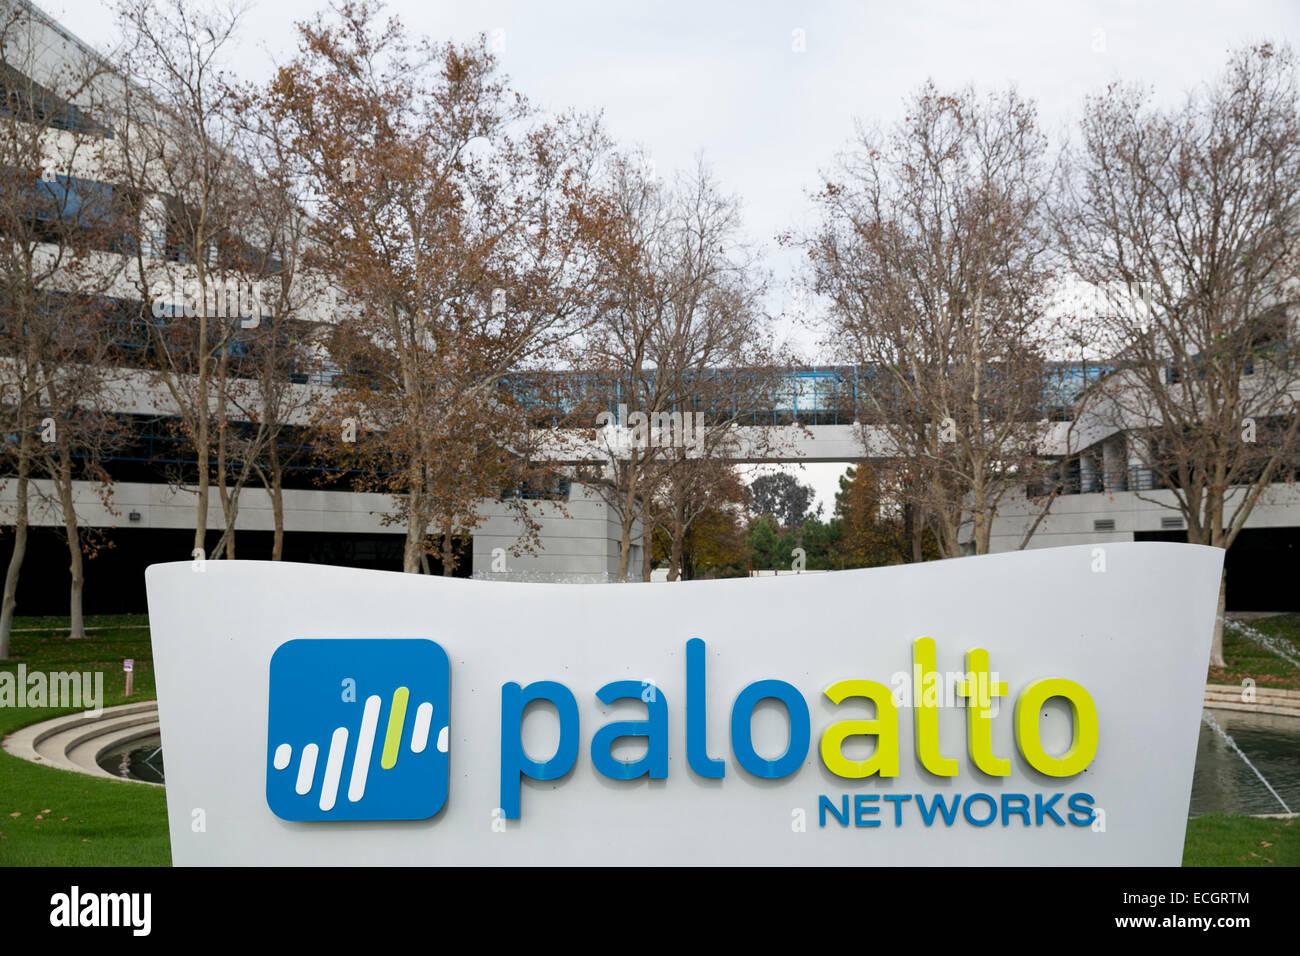 Palo alto stock photos palo alto stock images alamy the headquarters of palo alto networks stock image biocorpaavc